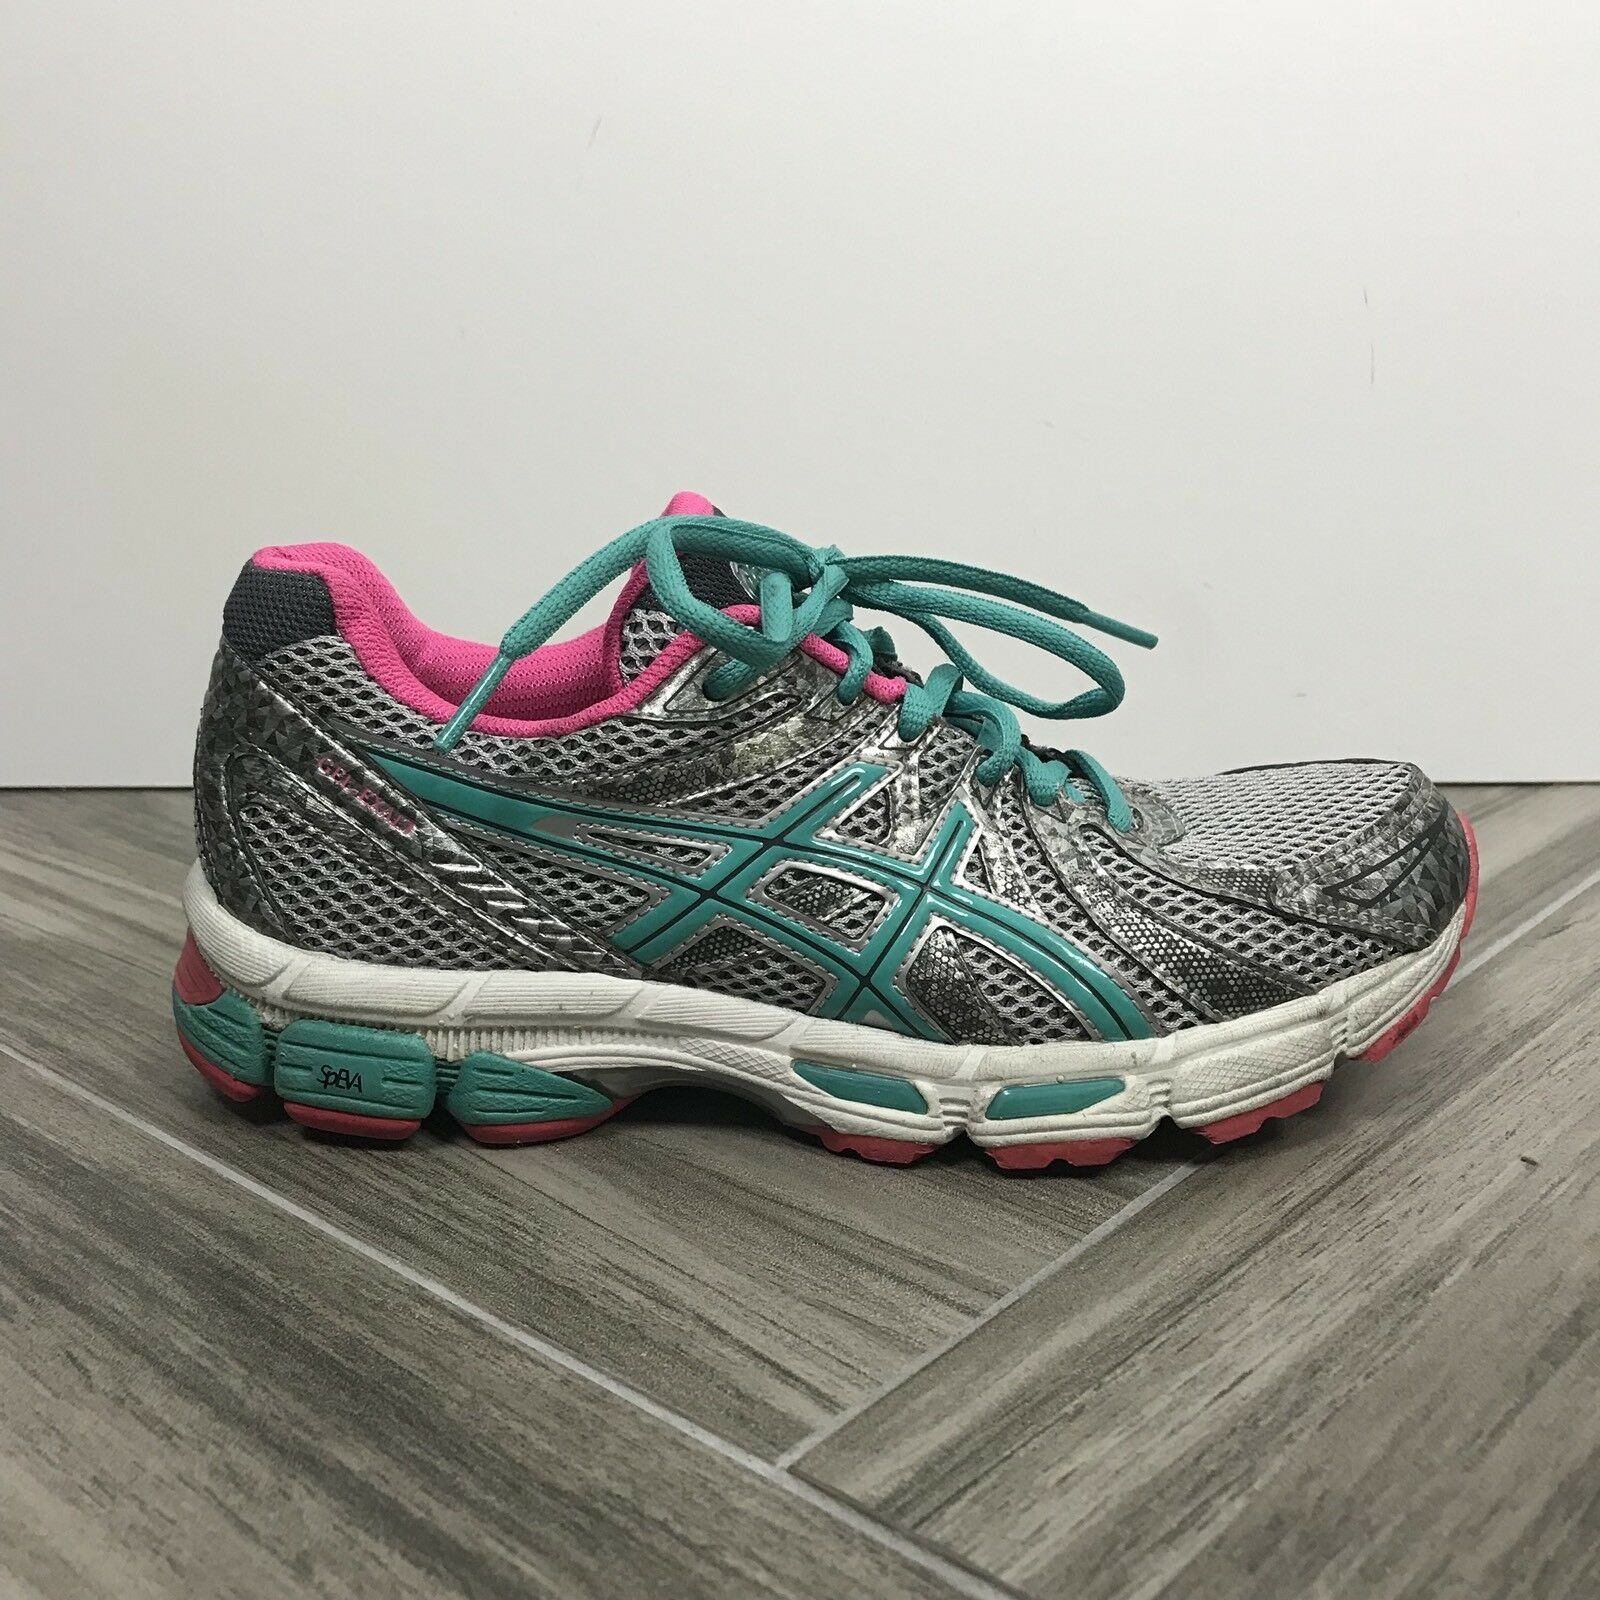 Asics Gel Exalt rose Teal Running chaussures Sz 7 Lace Up Casual EUC Metallic argent